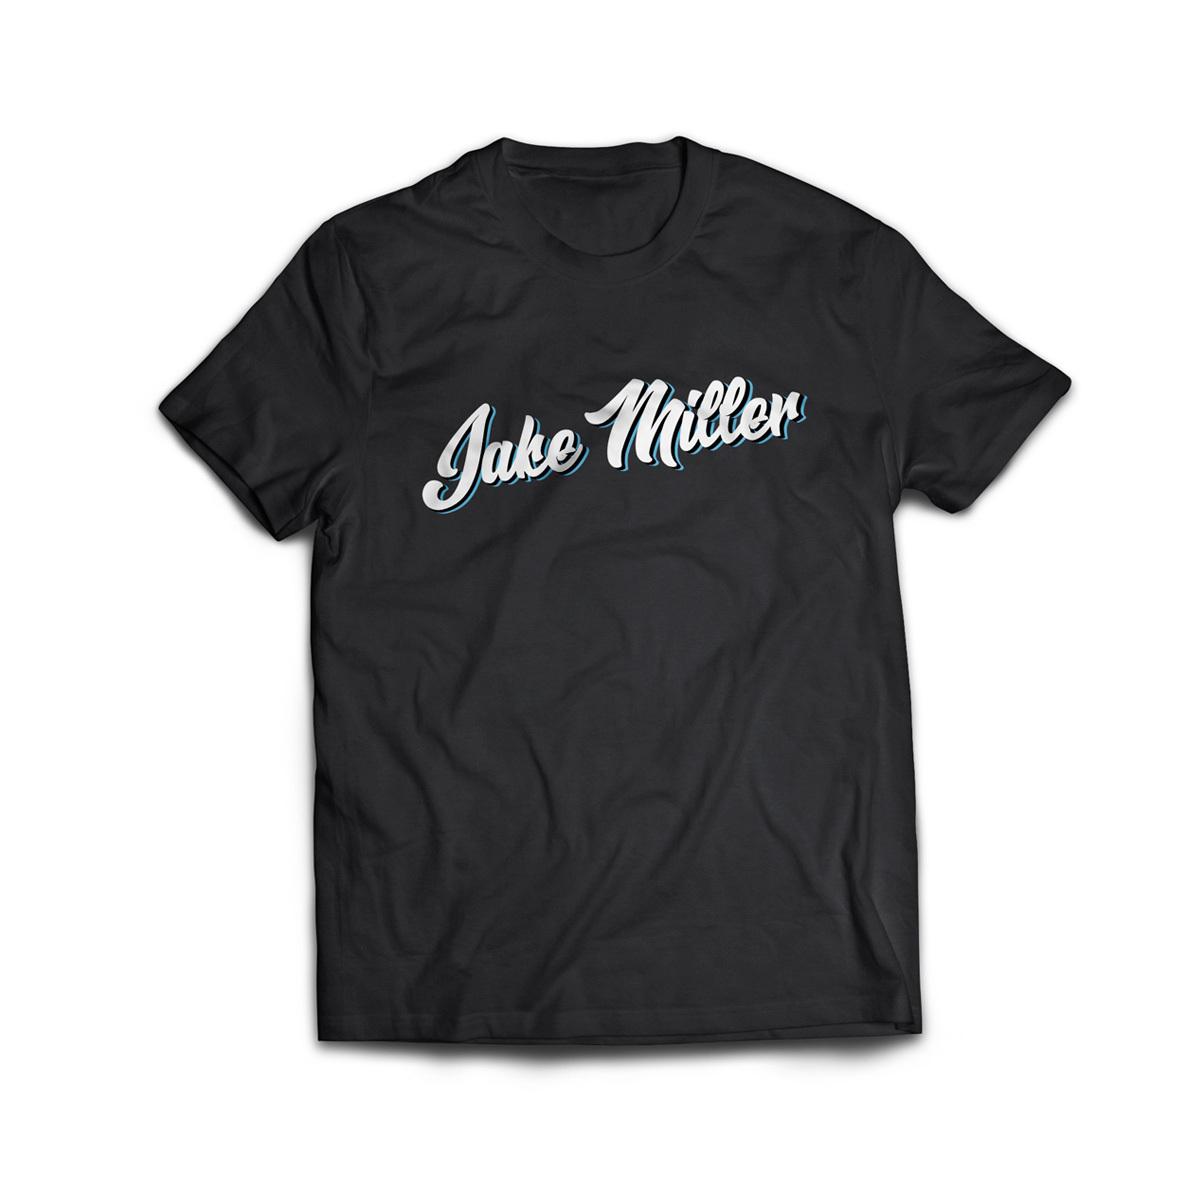 Miami Vice - Black T-Shirt